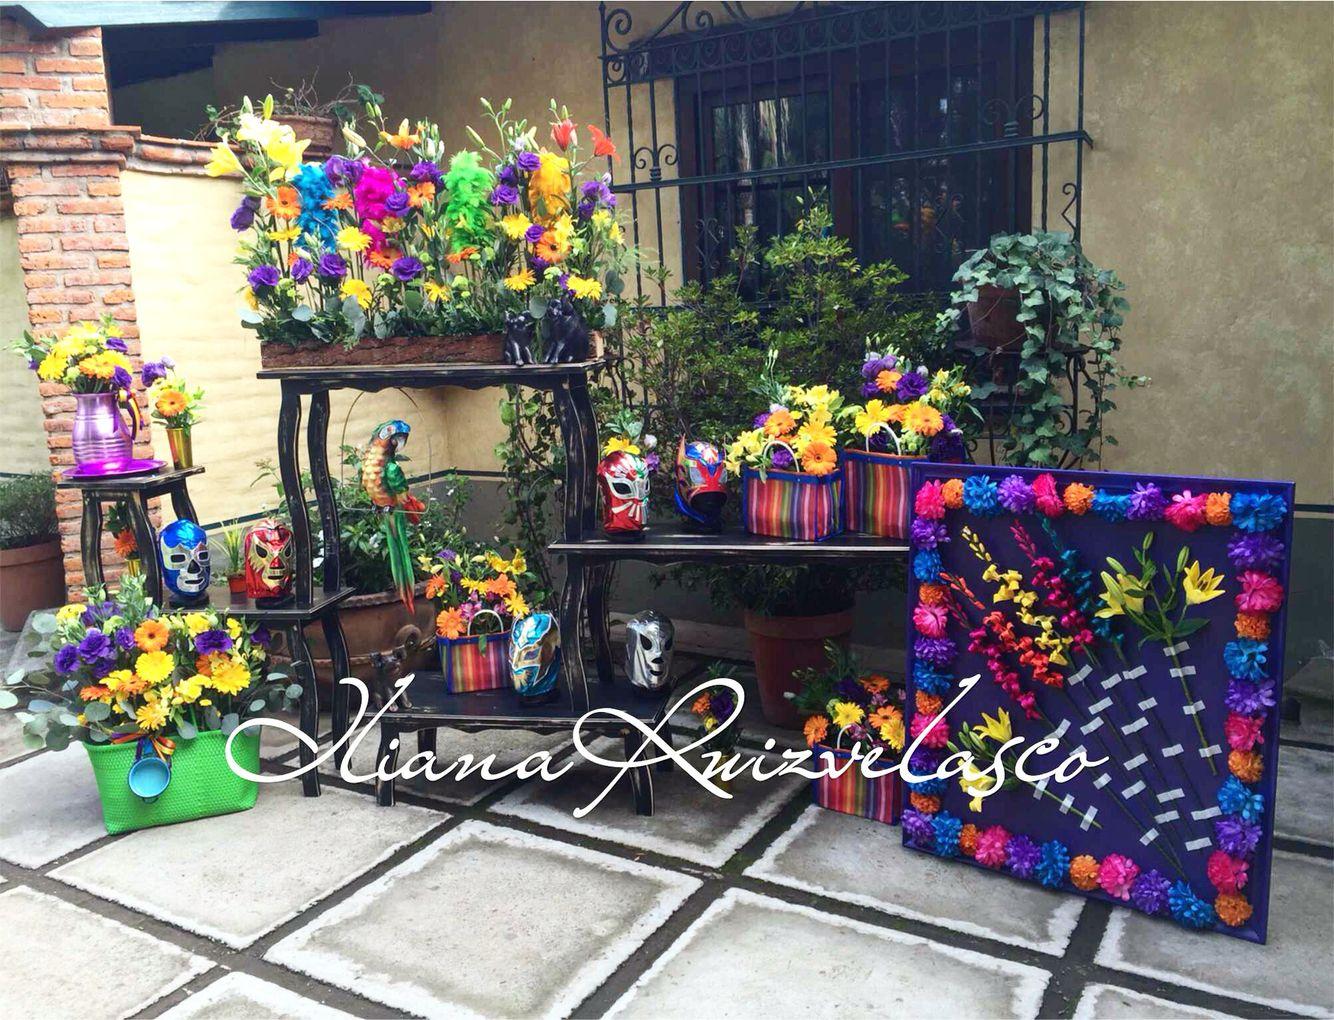 Estilo Kitsch #Decoración #PrimeraComunion #Eventos #Flores #IlianaRuizvelasco